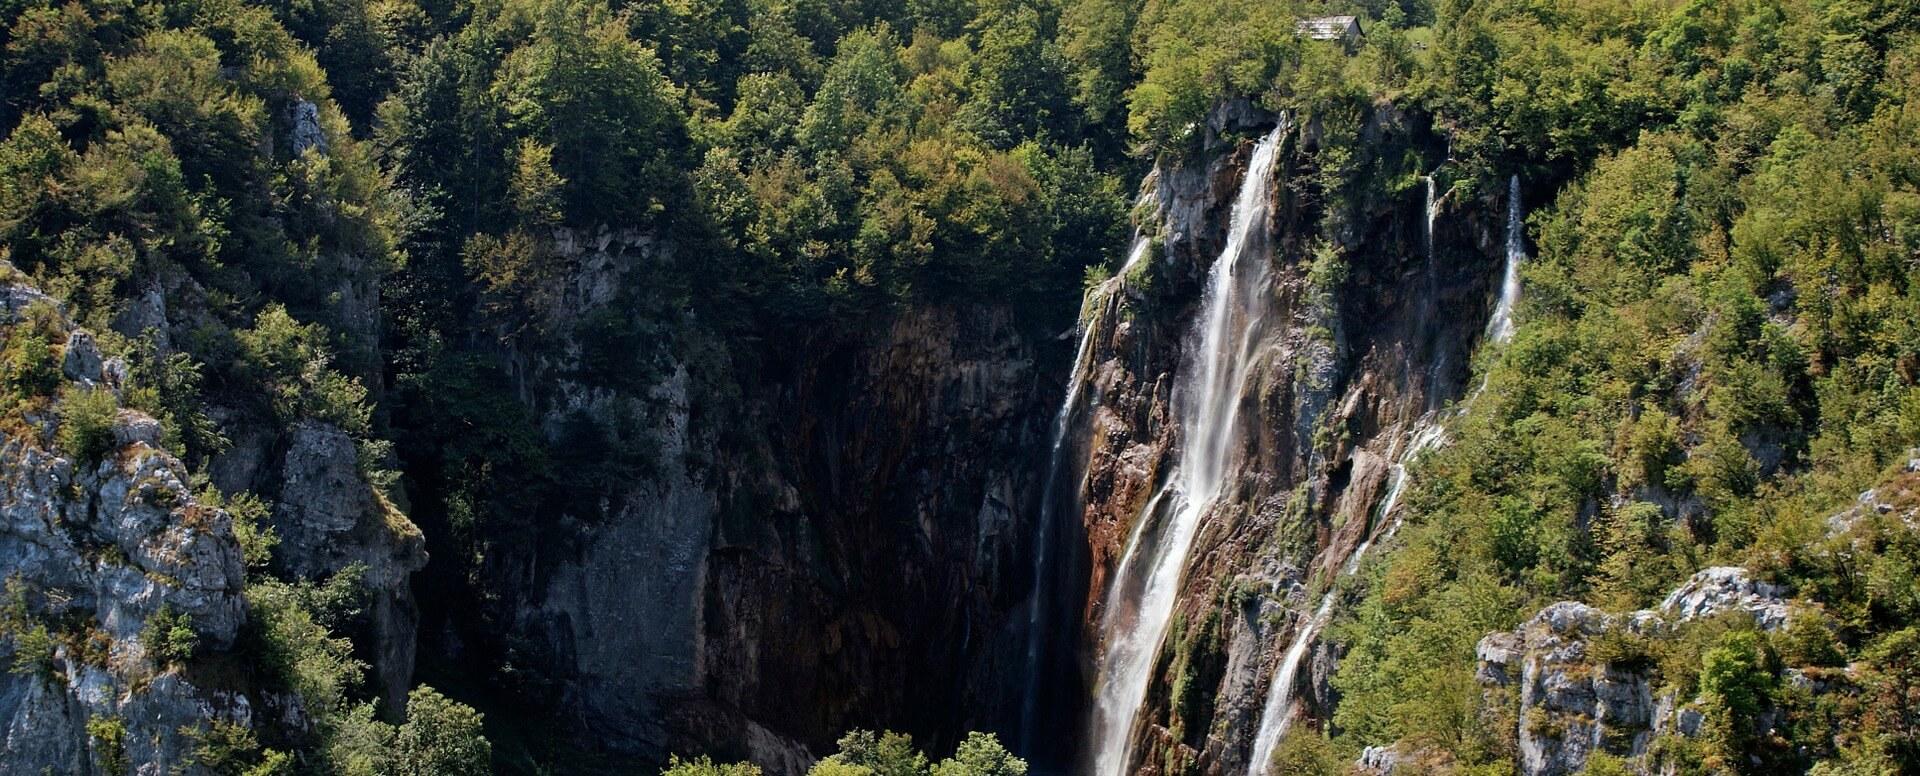 Randonnée en pleine nature - Croatie